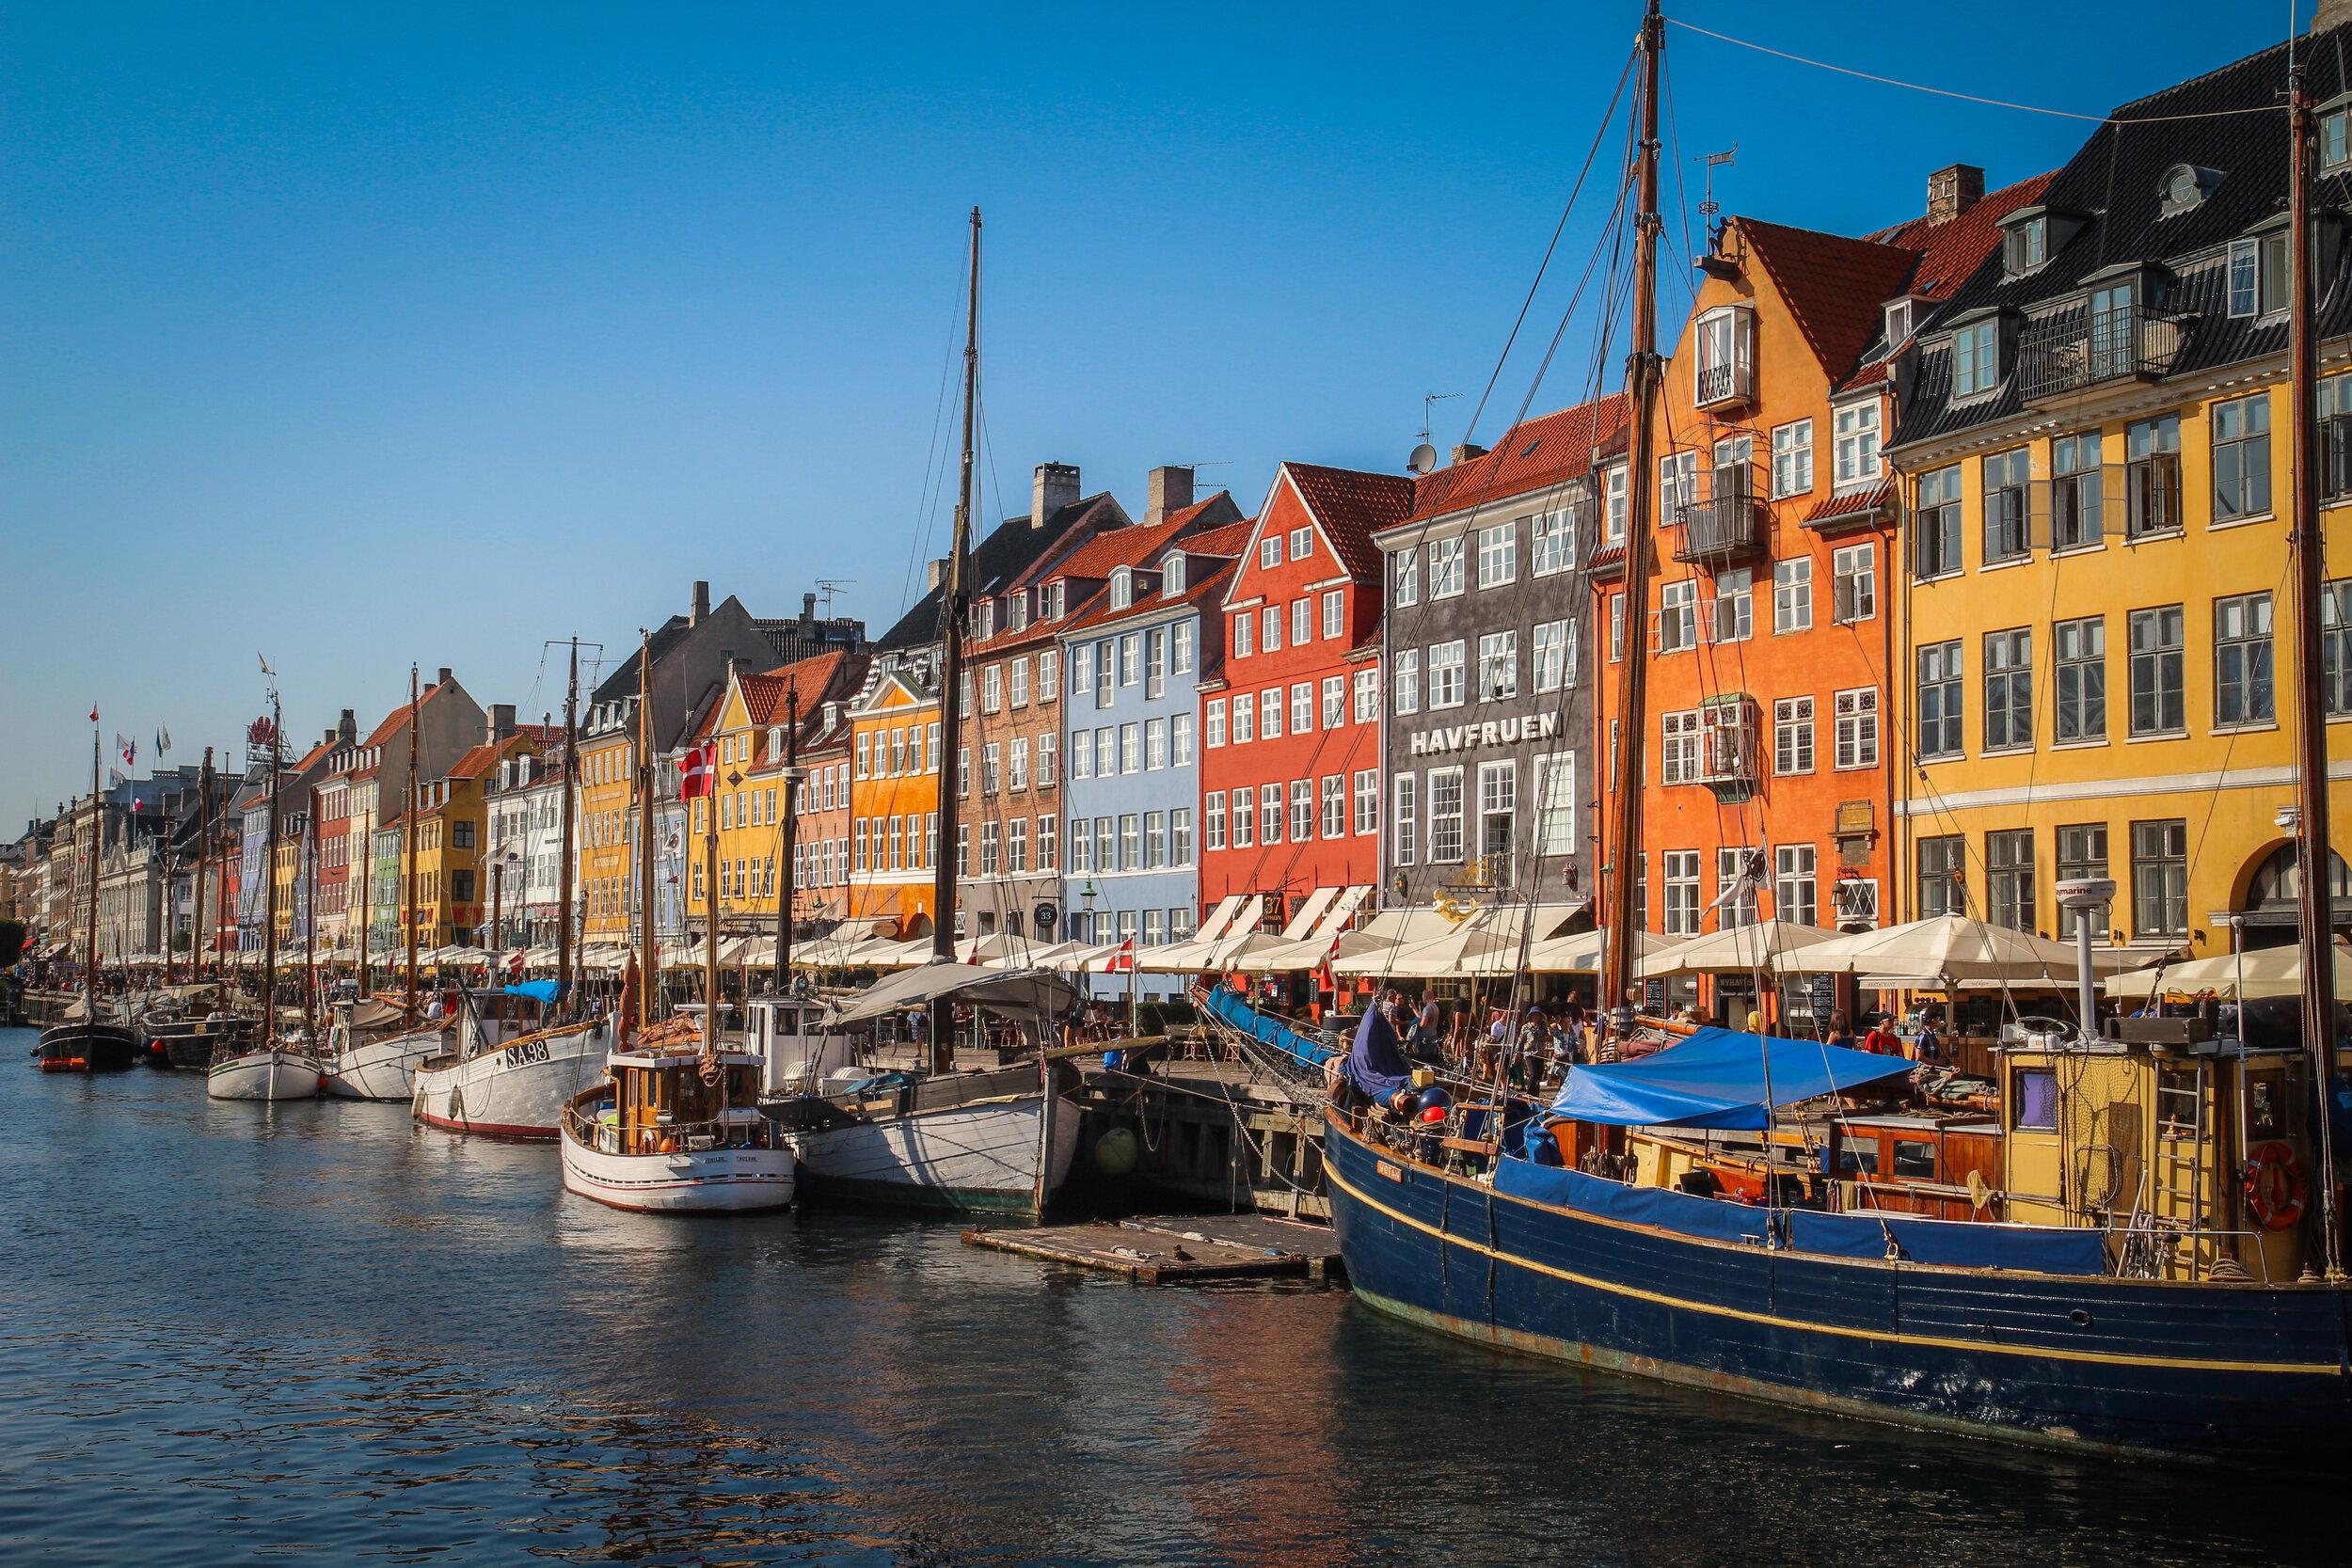 Kopenhagen_denemarken_Tui-47.jpg